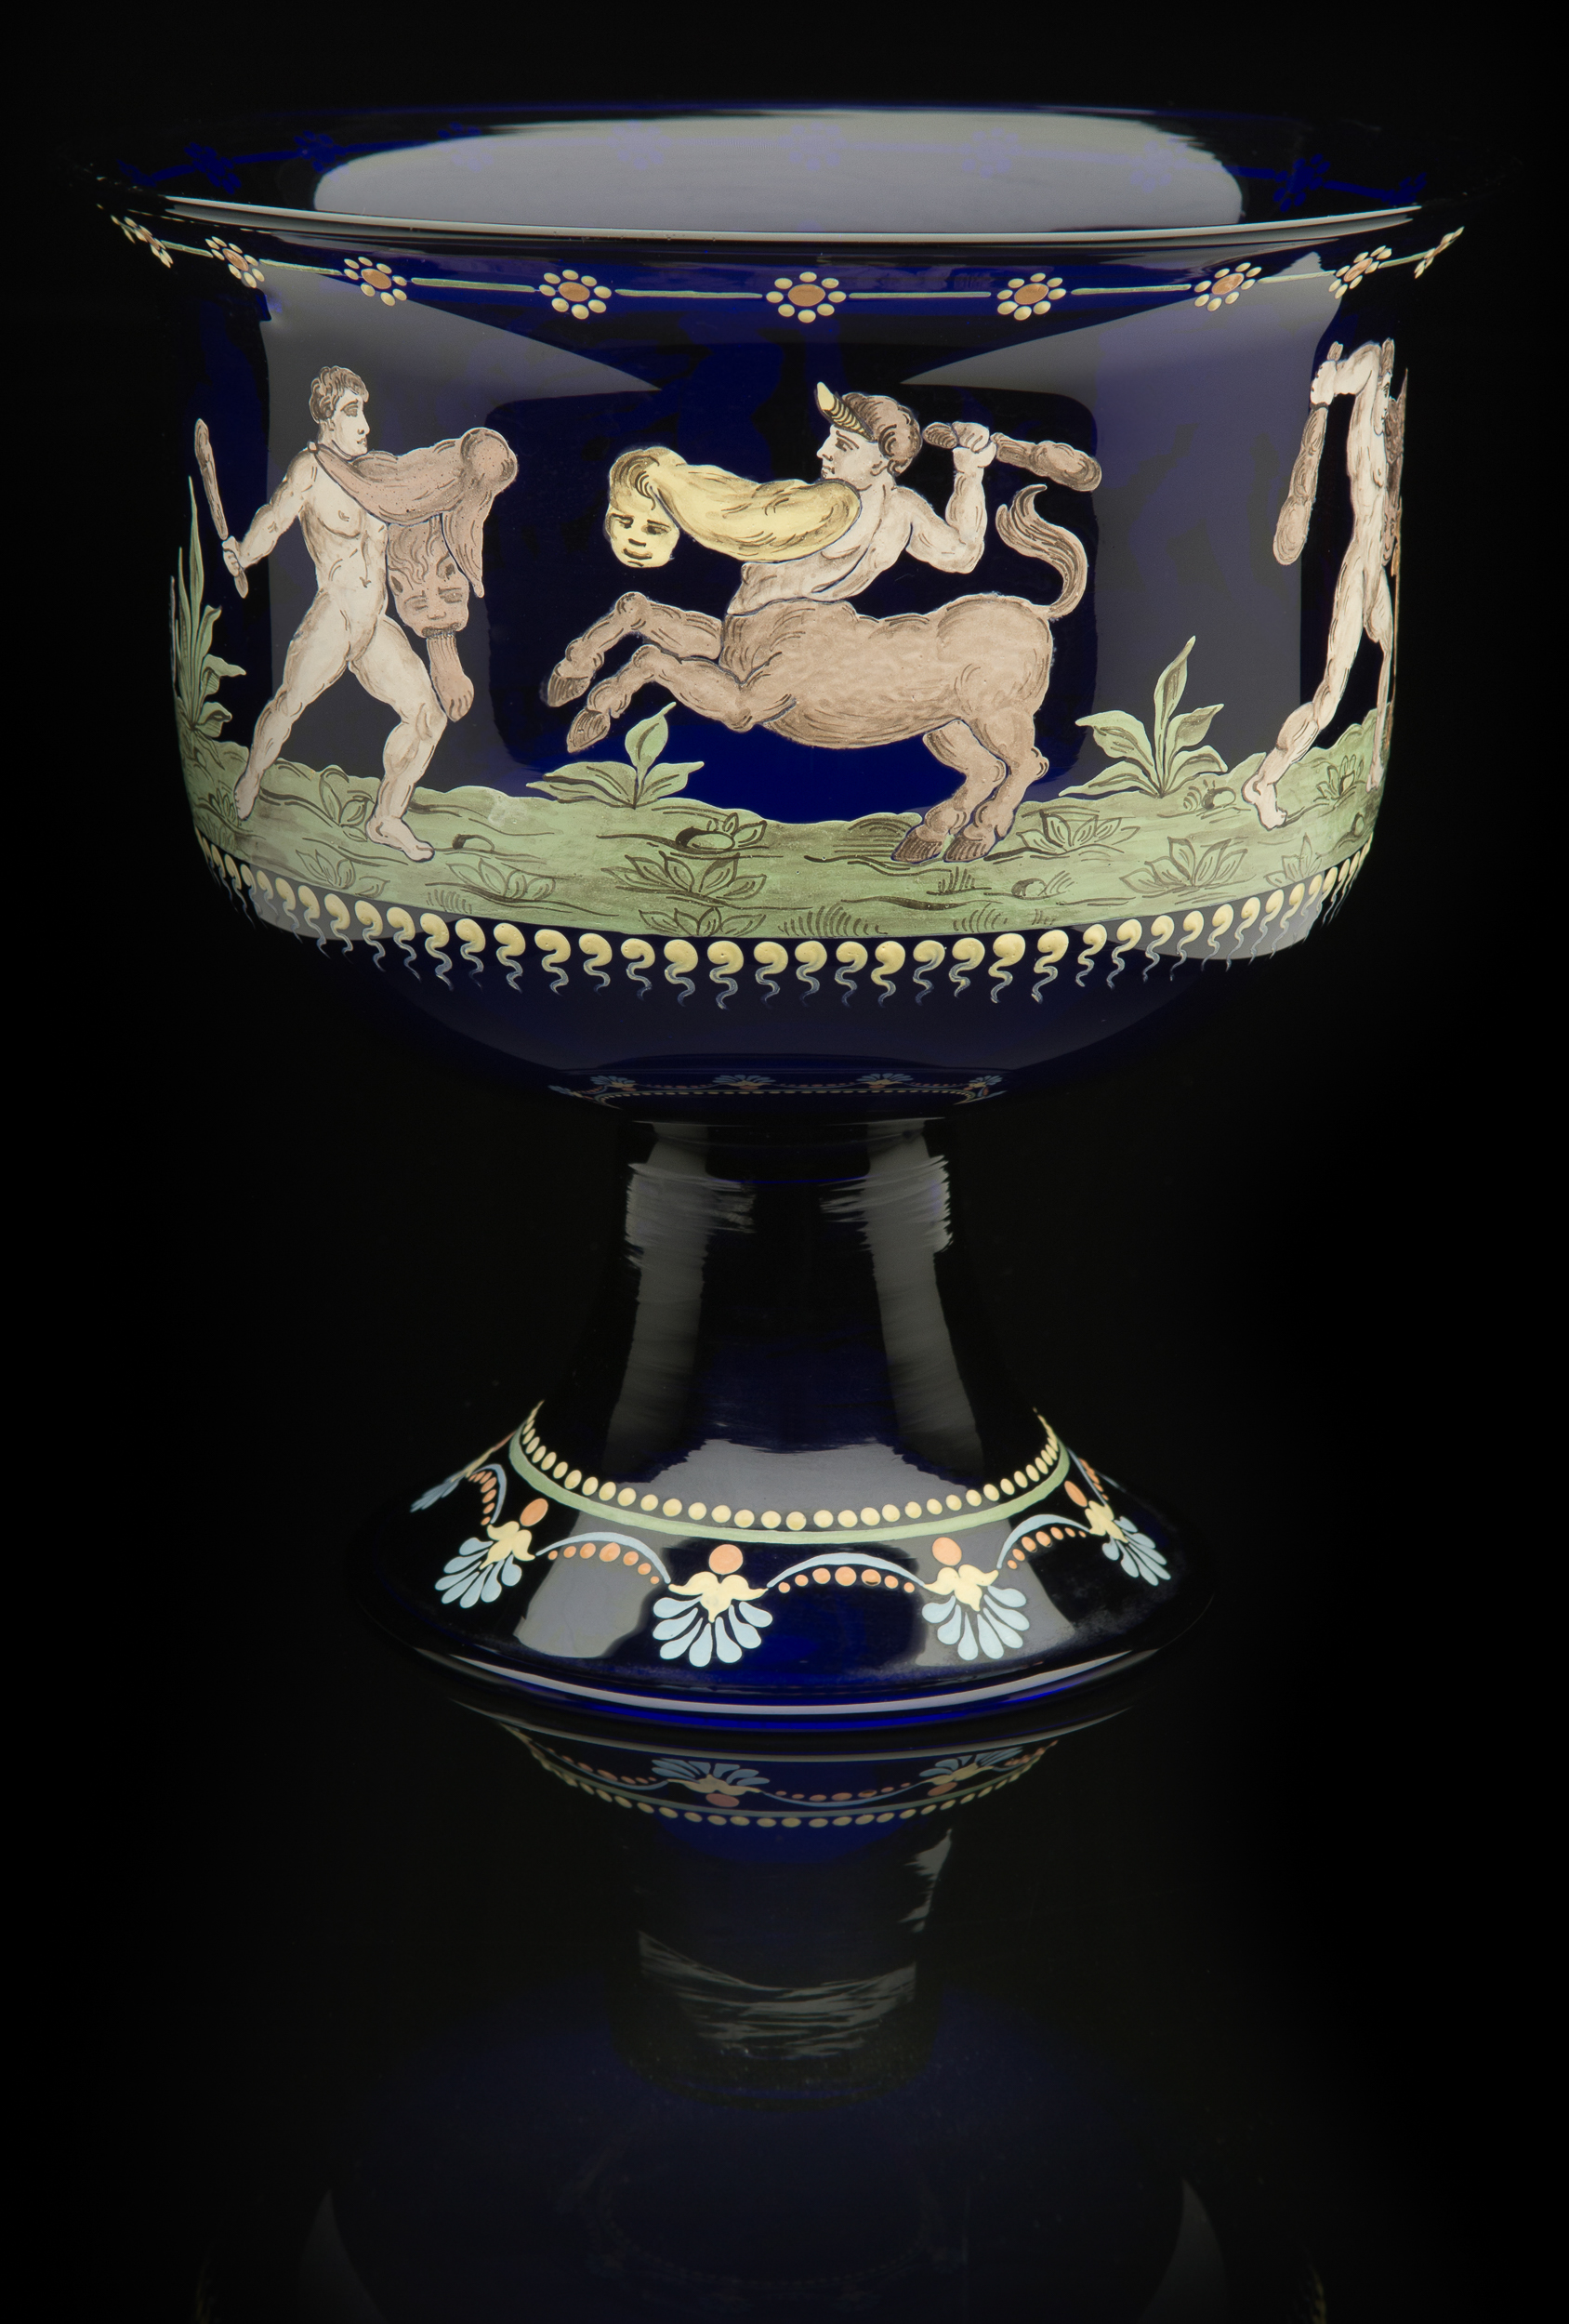 Francisco Toso Borella, Vase: Labors of Hercules (1900-1920, glass and enamel, 8 x 7 1/2 x 7 1/2inches), VV.479